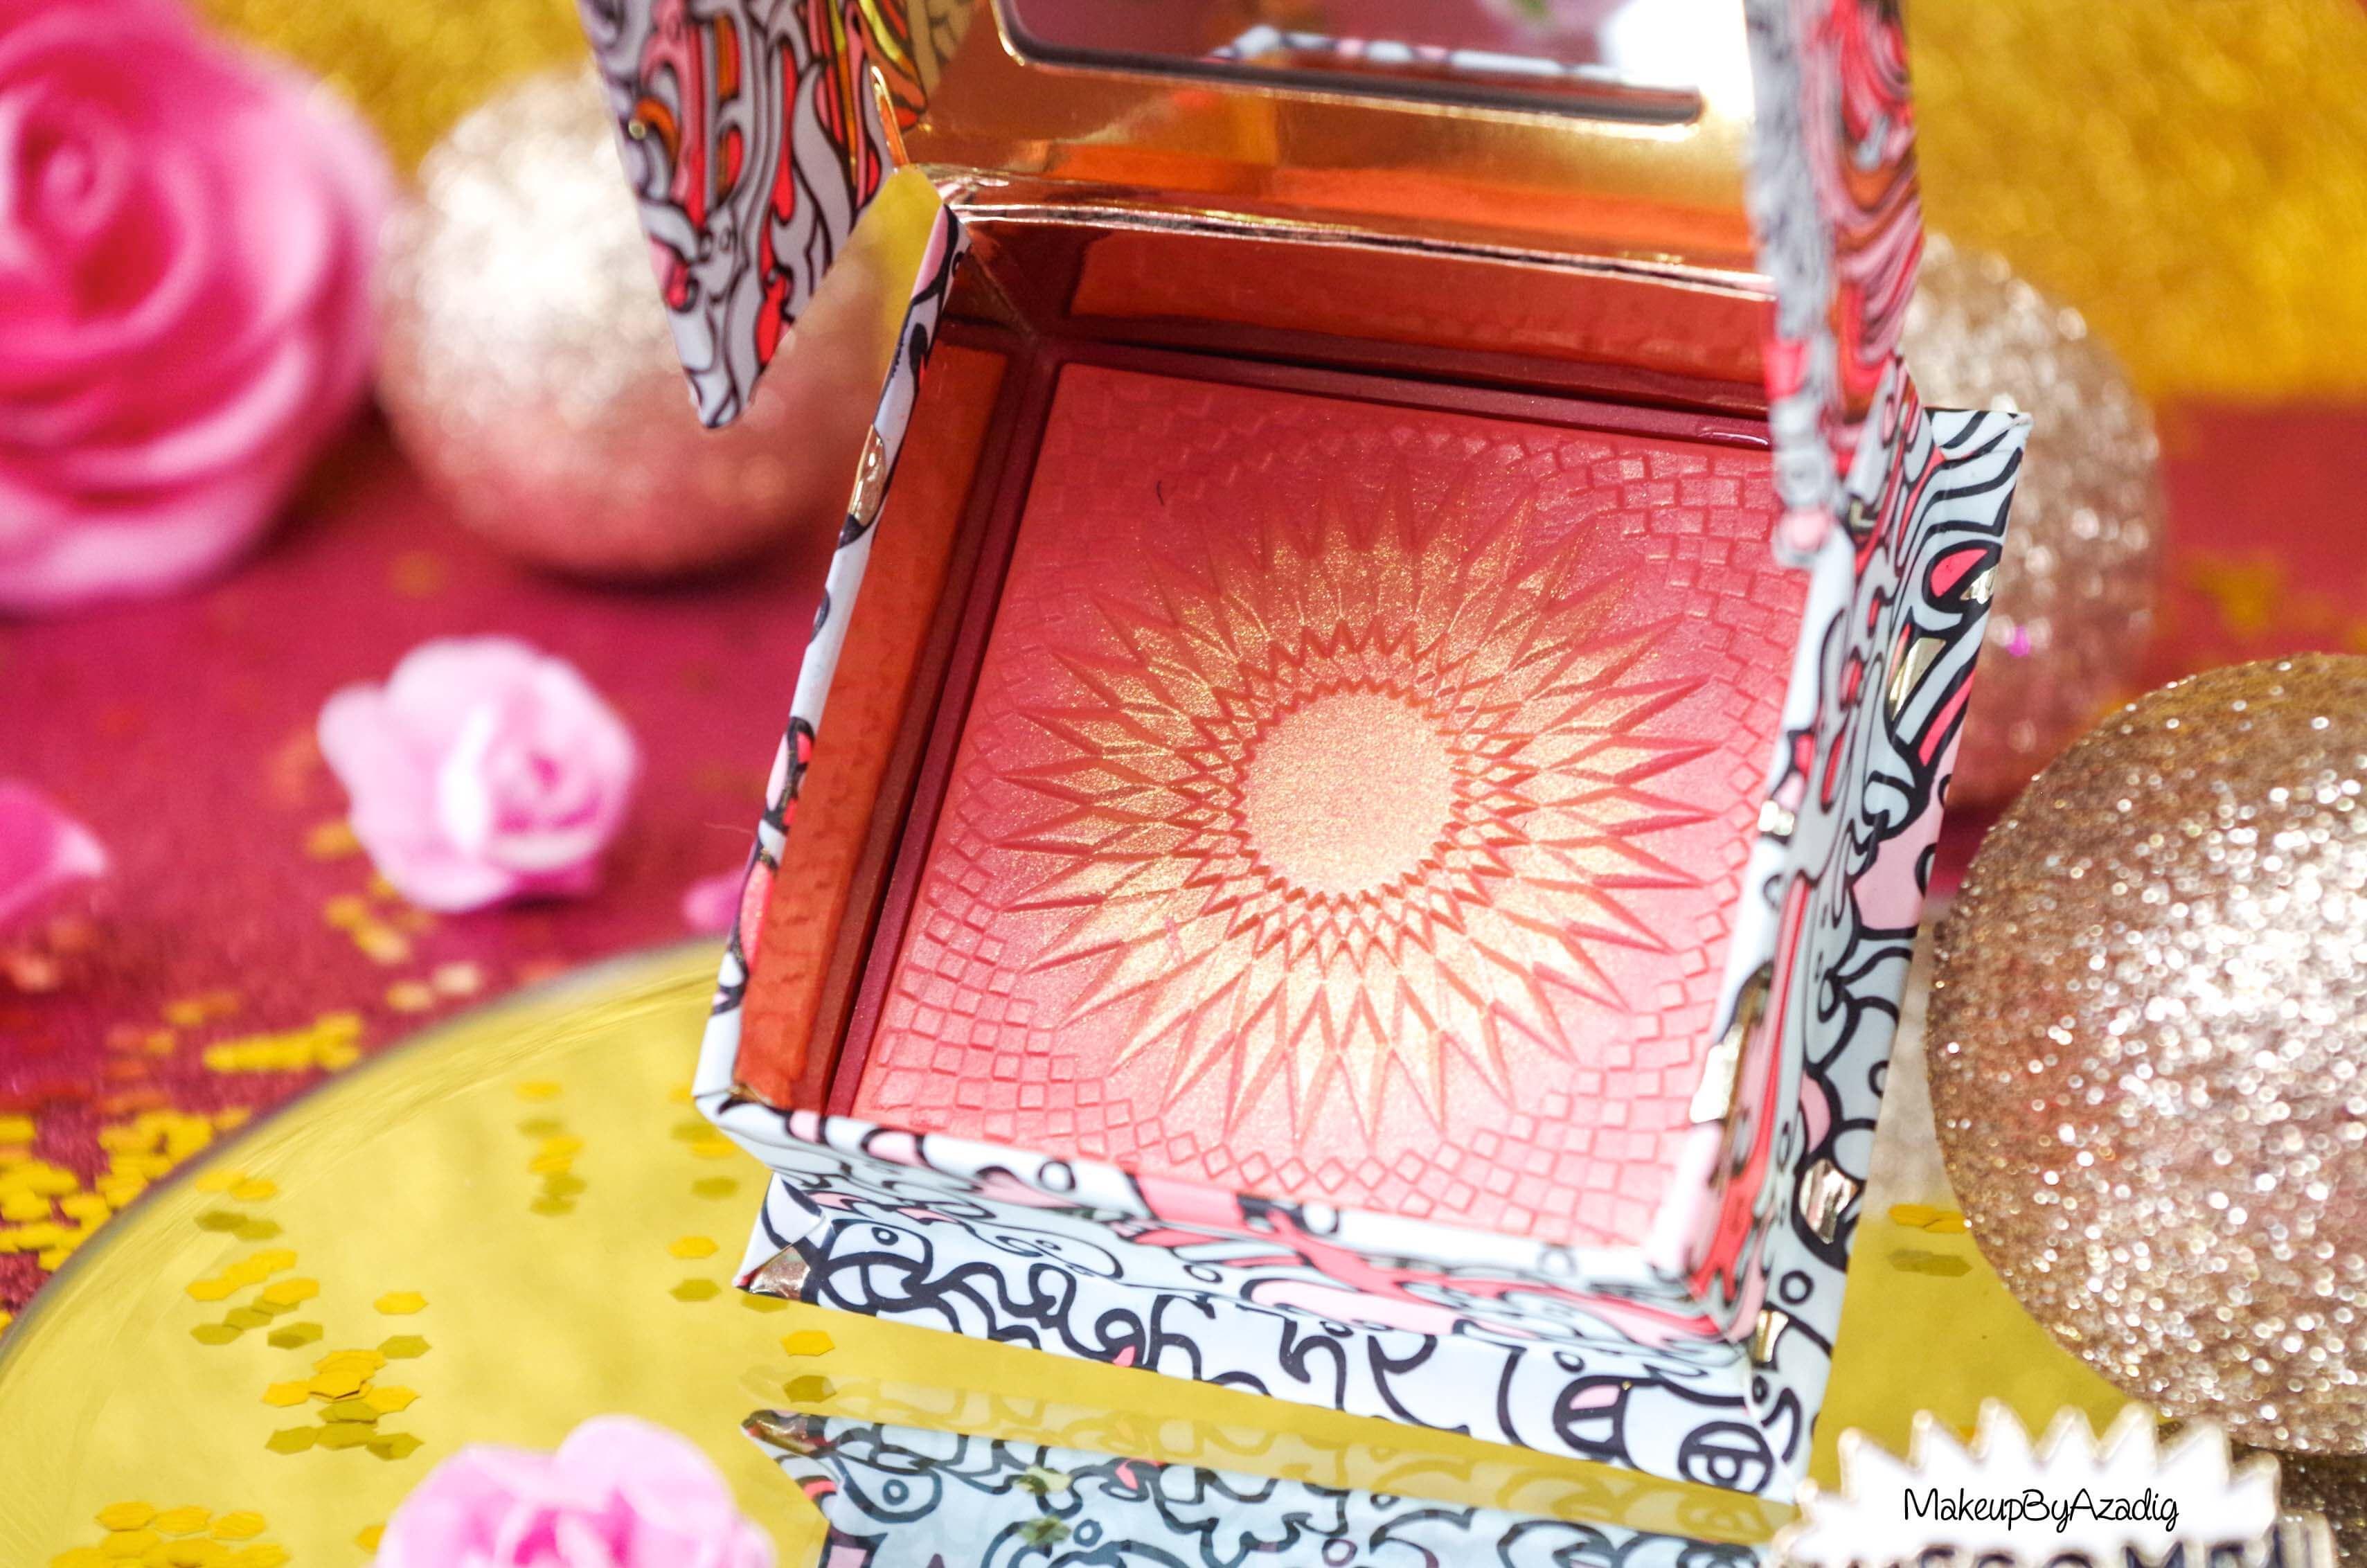 gold-revue-review-blush-benefit-galifornia-san-francisco-sunny-golden-pink-blush-avis-prix-sephora-makeupbyazadig-coachella